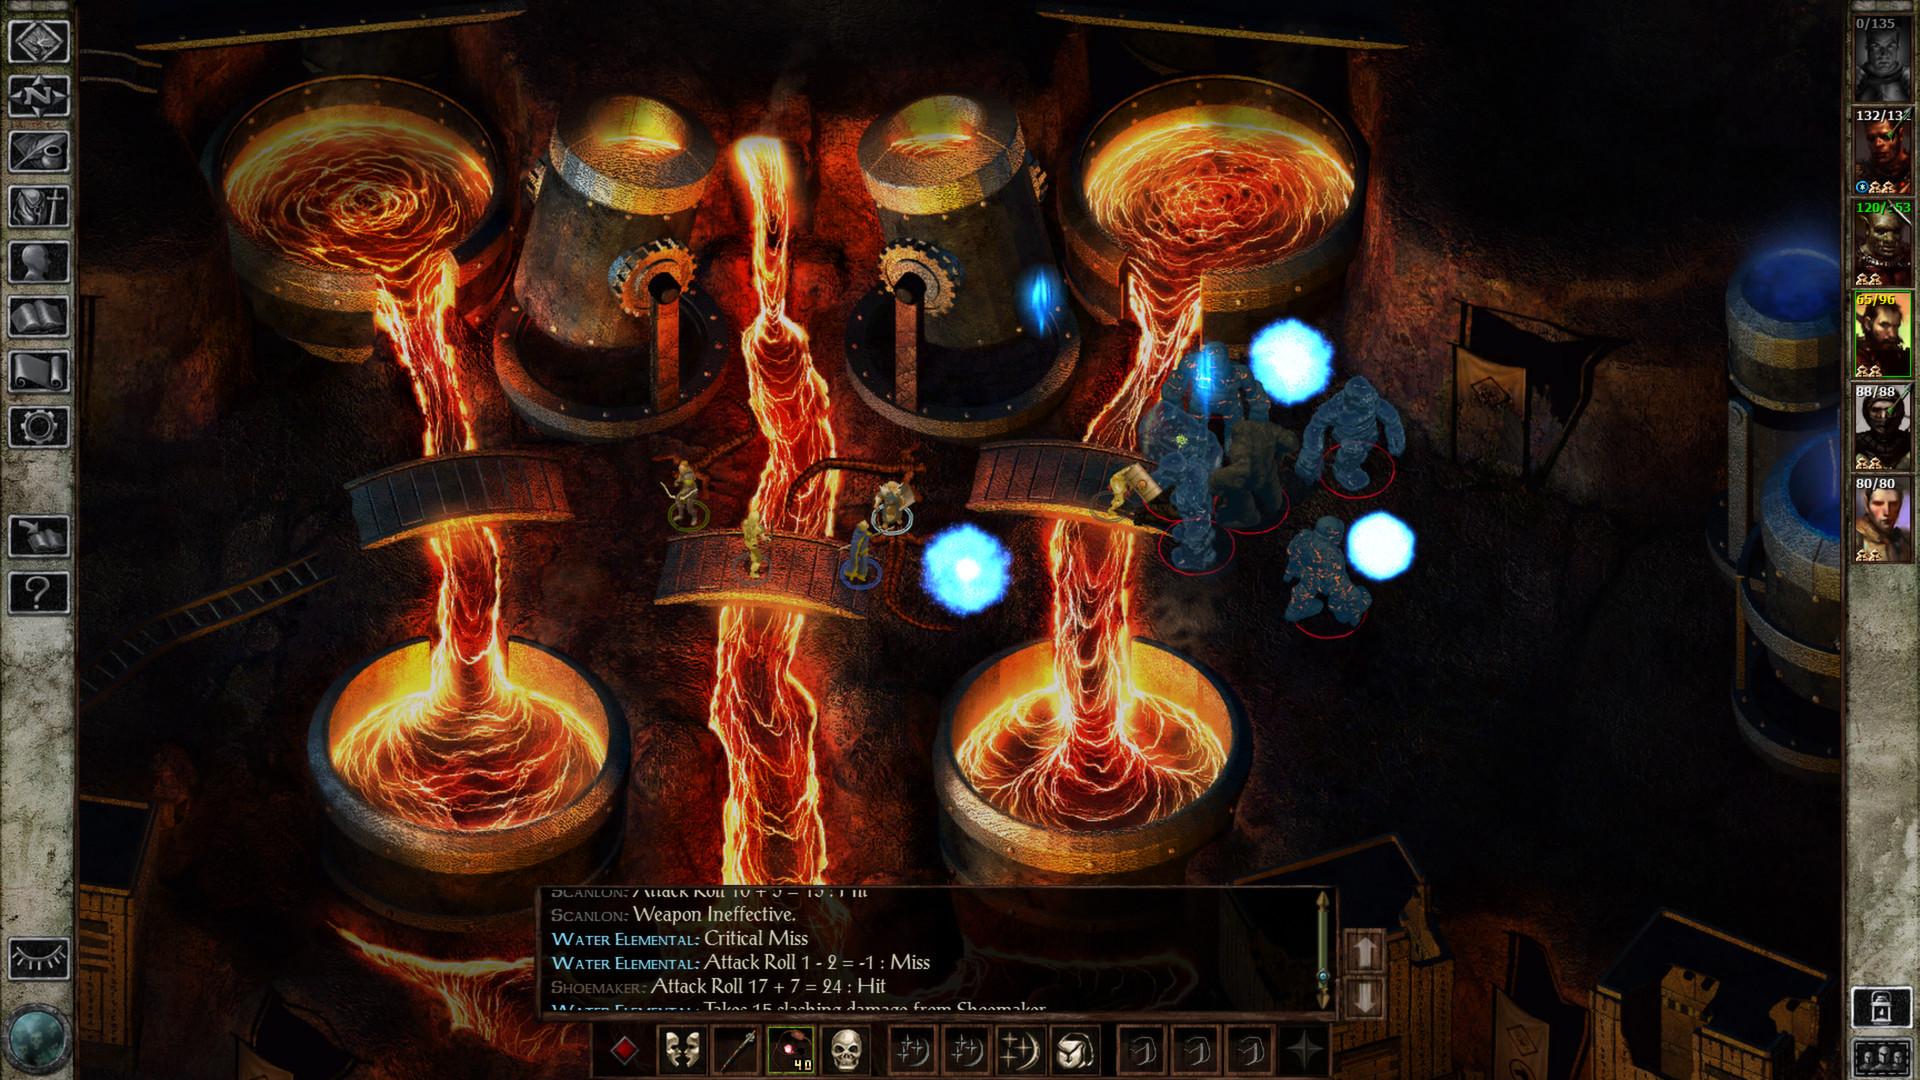 Icewind Dale: Enhanced Edition [v.2.5.17.0] / (2014/PC/RUS) / RePack от R.G. Catalyst